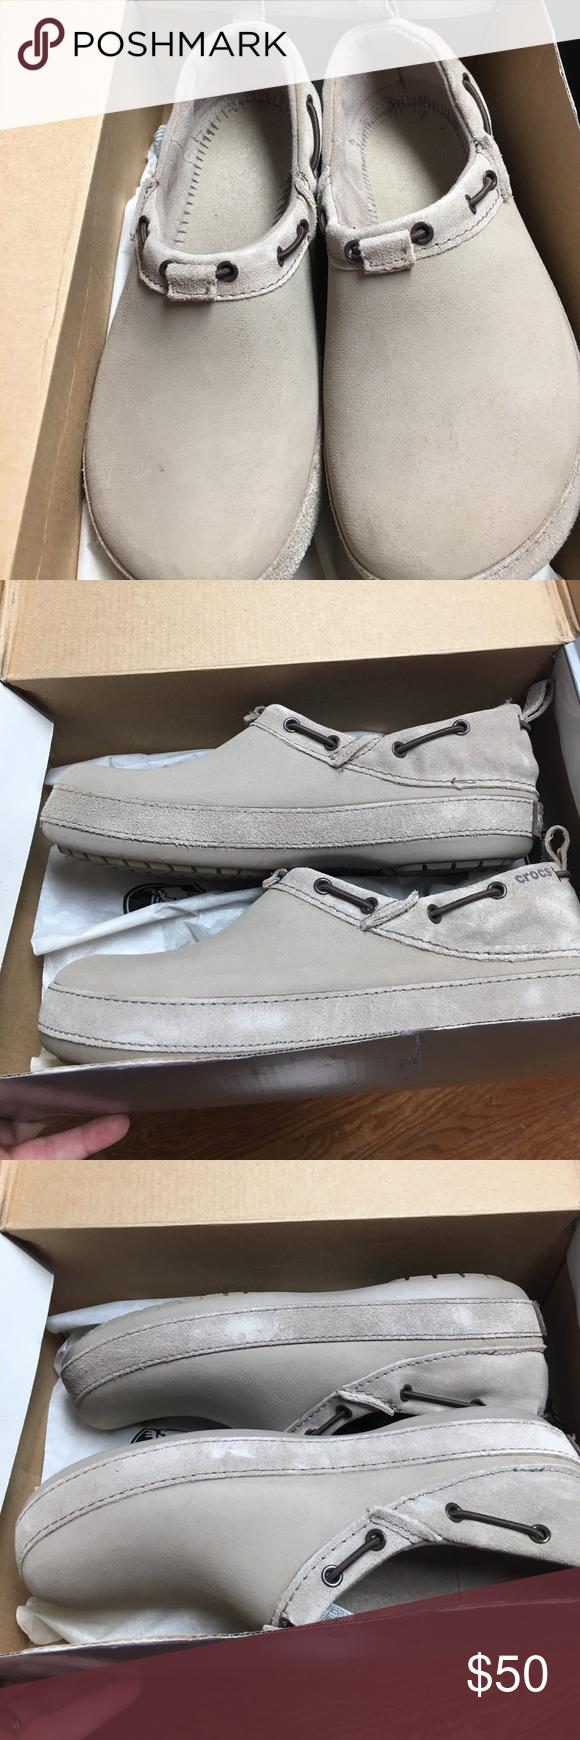 212baf3089 Croc nursing shoes EUC. Very little wear and markings. Mushroom color CROCS  Shoes Mules & Clogs